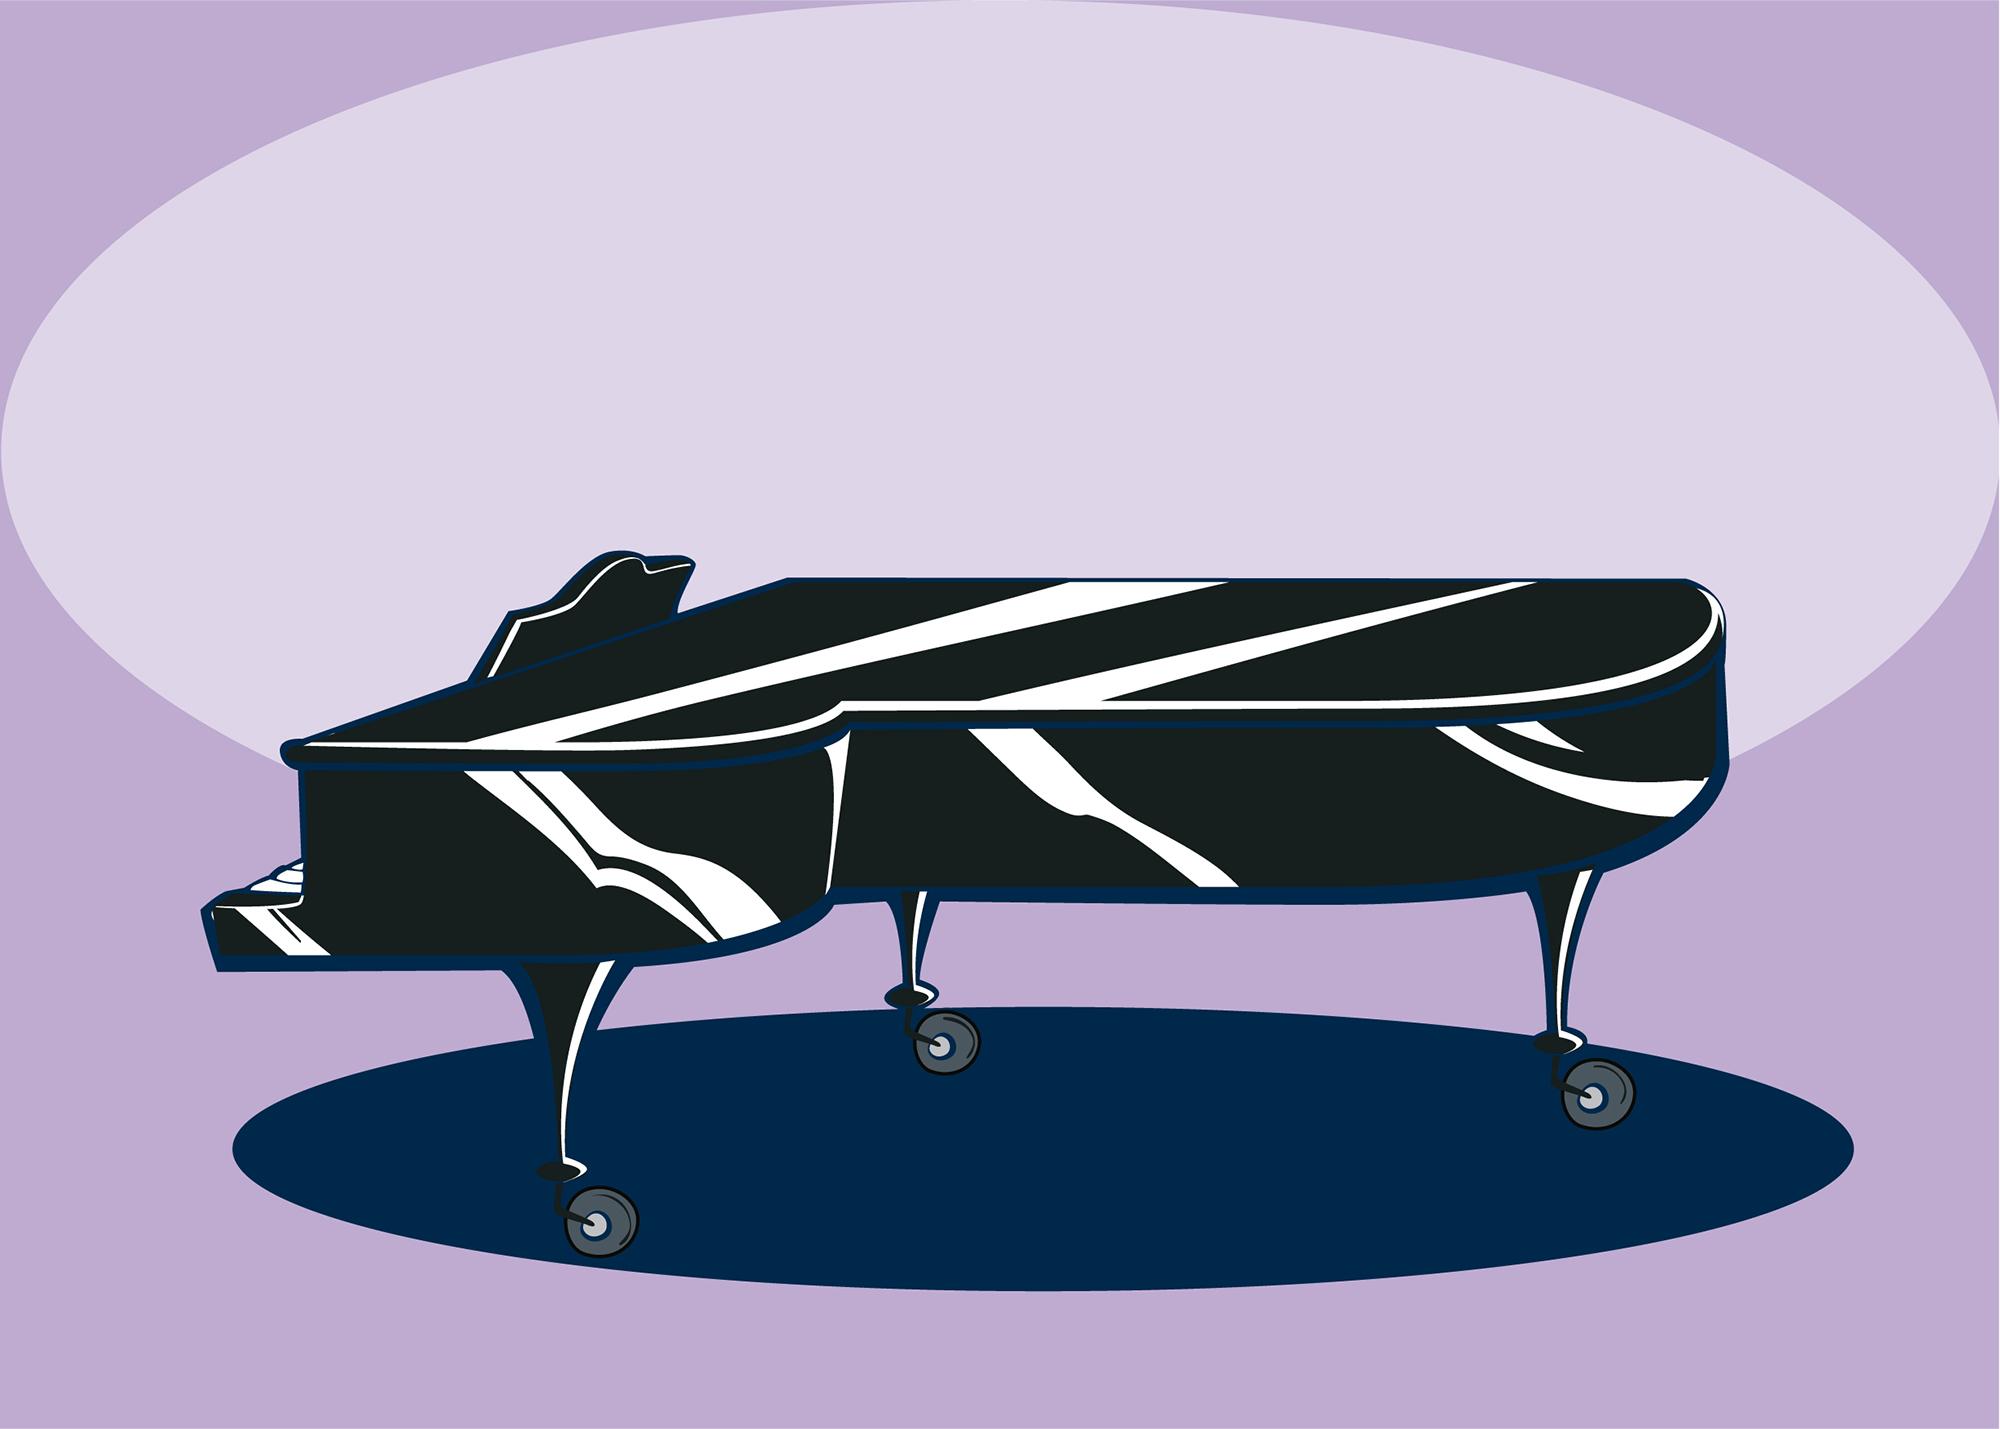 IMC_Christmas_2011_Piano